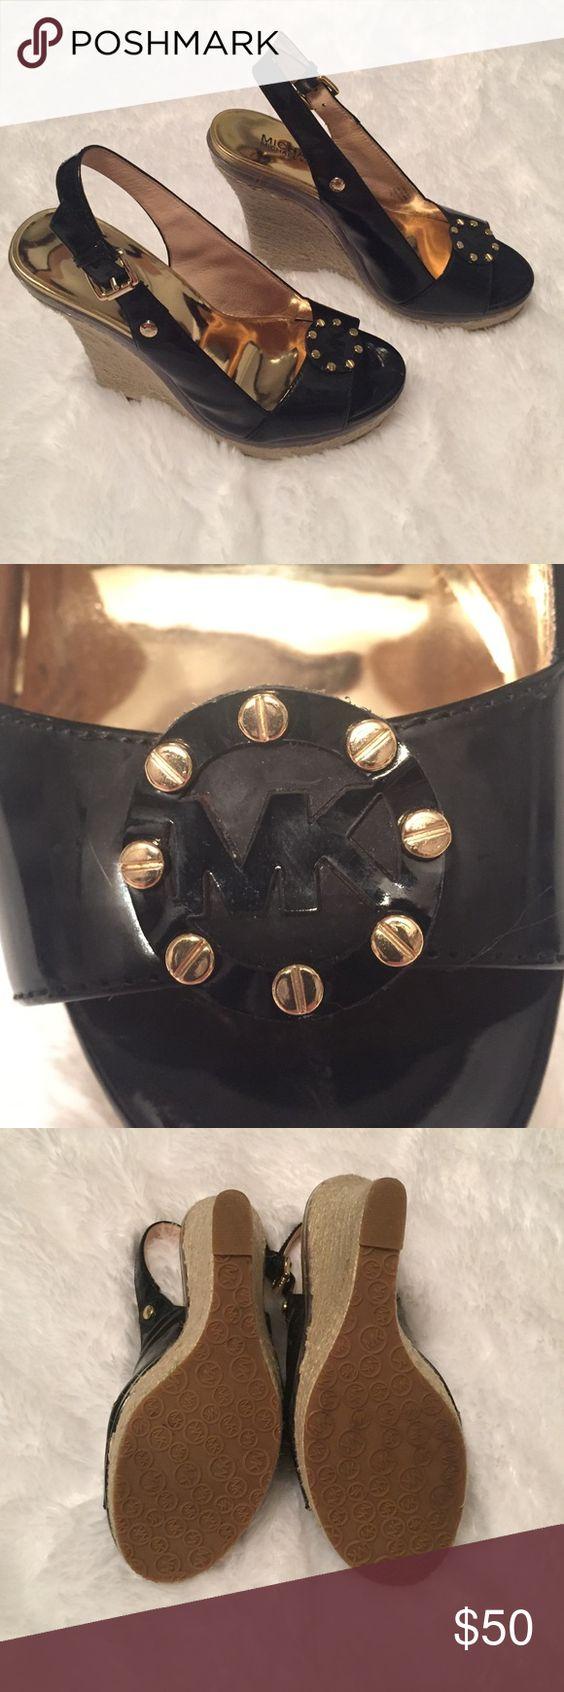 Black mk sandals - Michael Kors Wedge Sandals Black Patent Wedge Sandals Mk Logo Across Top Of Foot